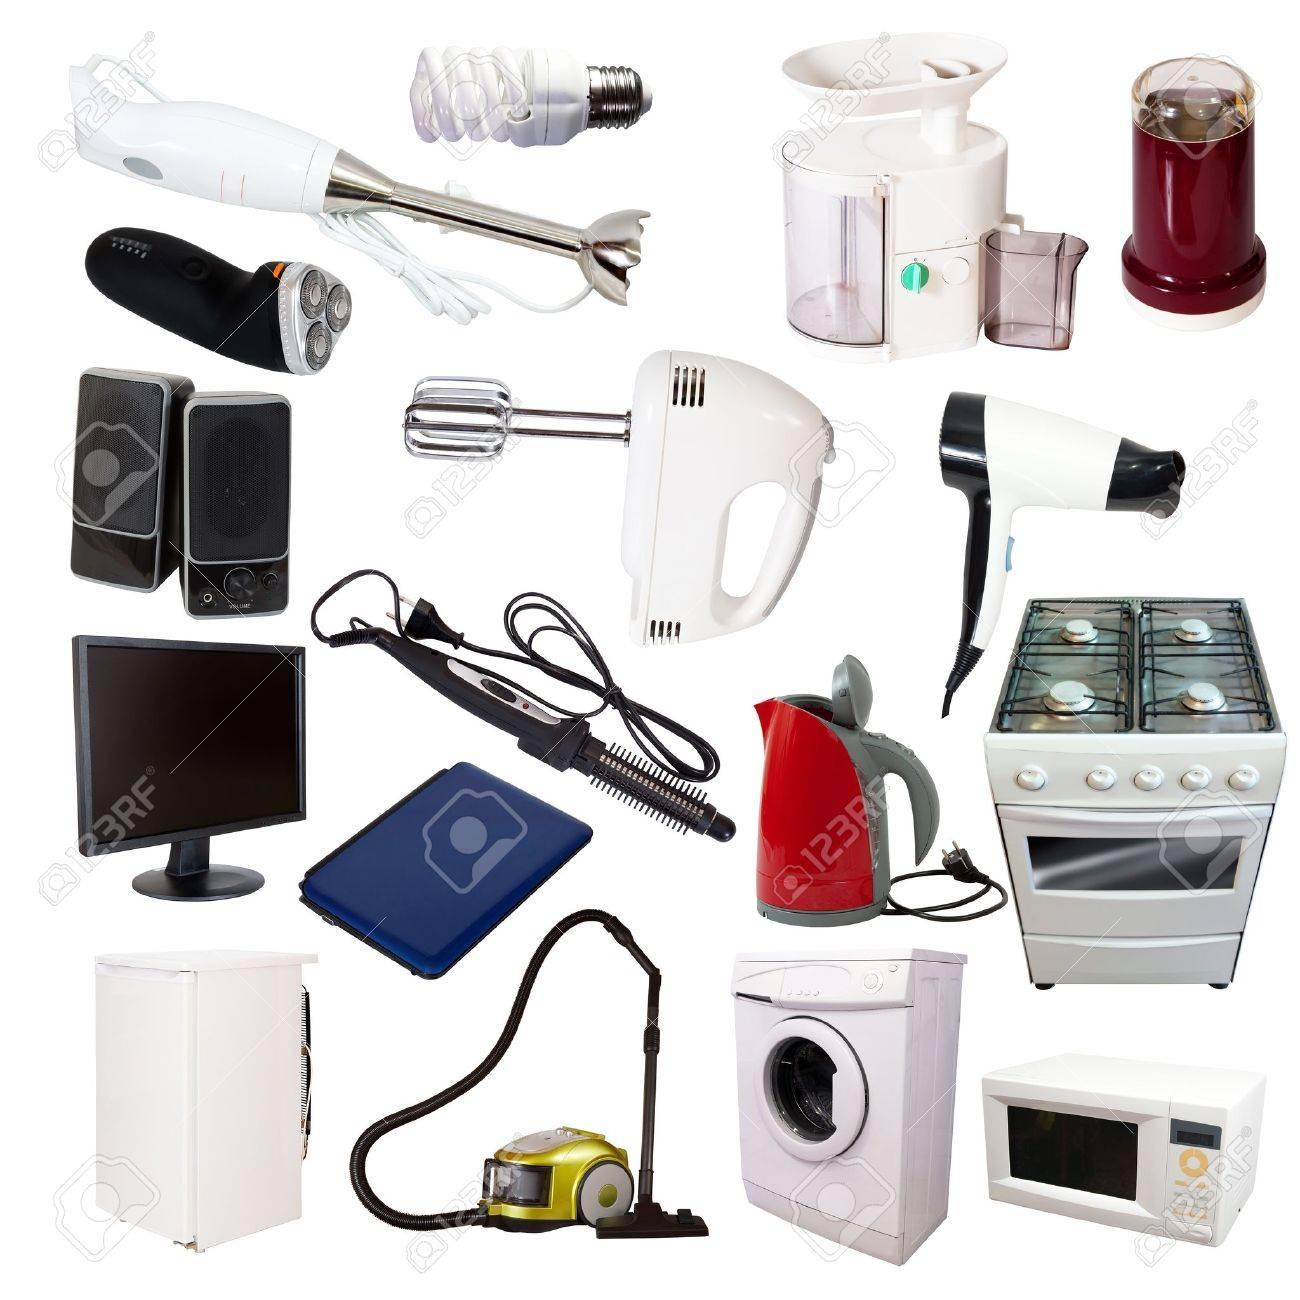 Set of  household appliances. Isolated on white background Stock Photo - 16802979